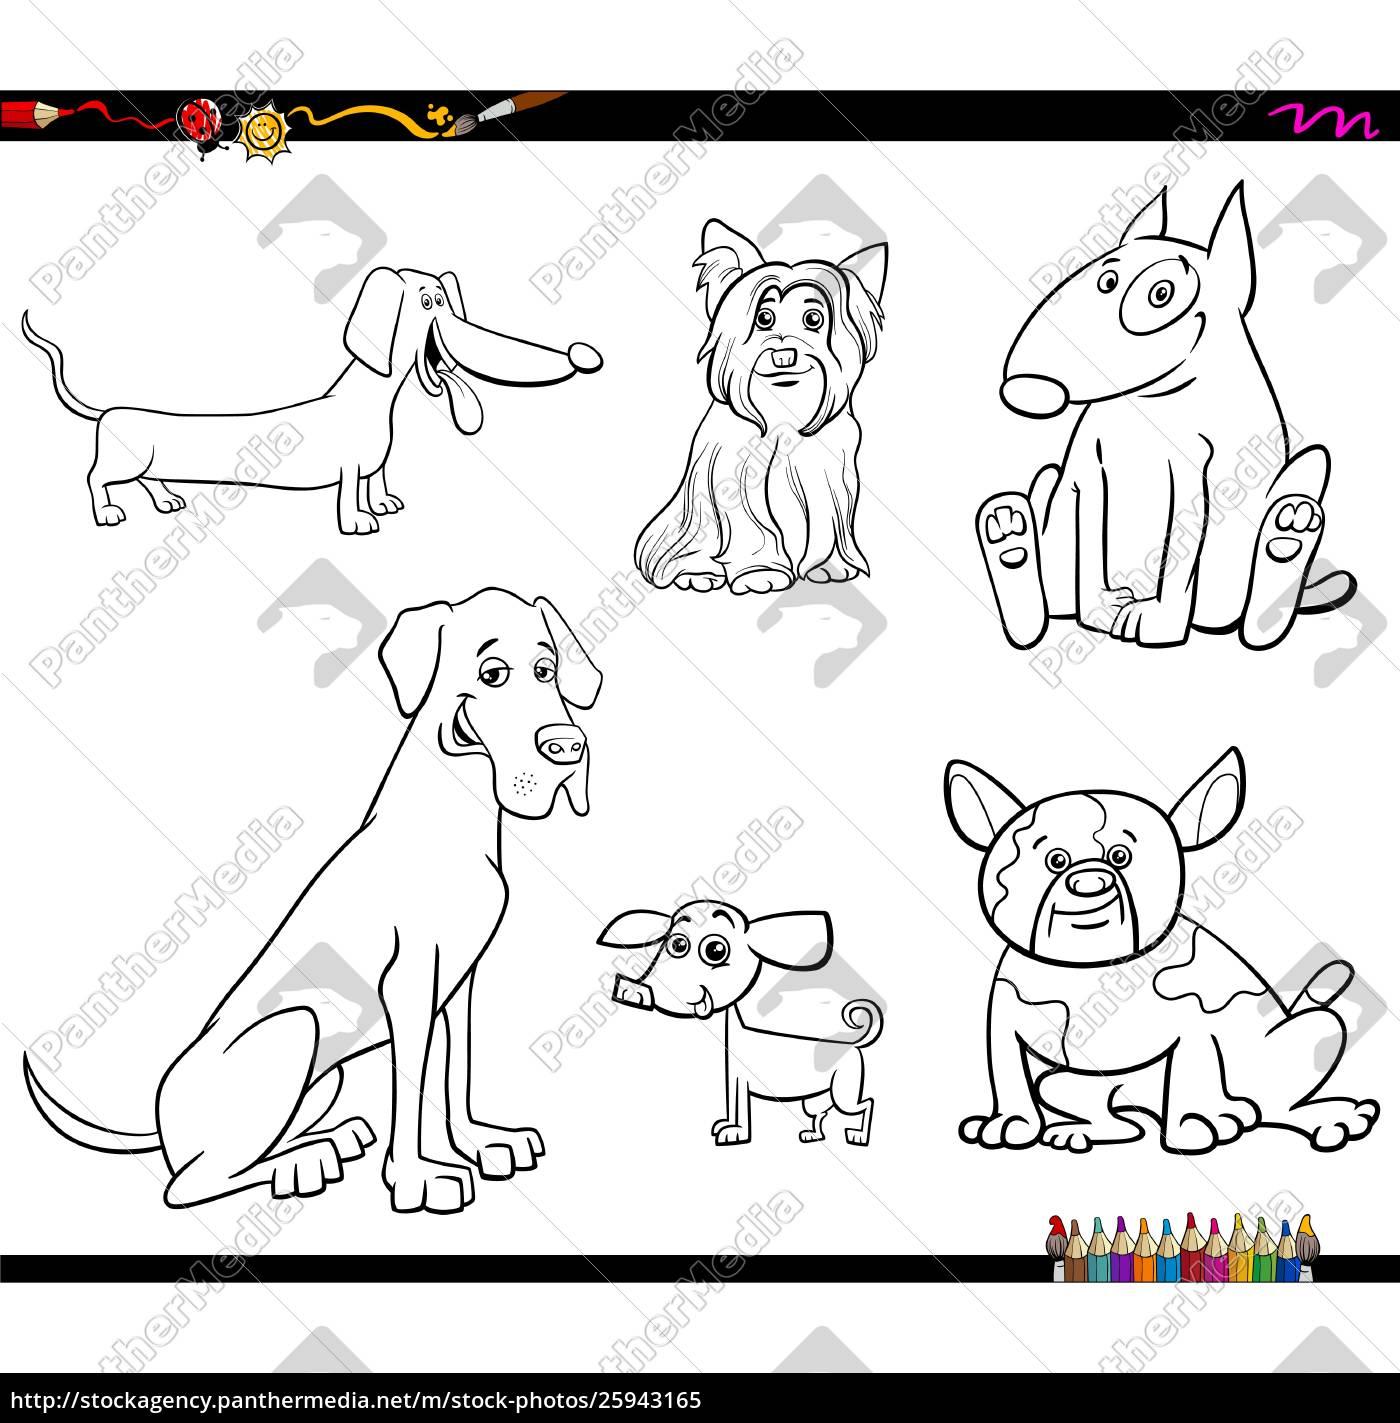 royalty free vector 25943165 - cartoon purebred dog characters color book